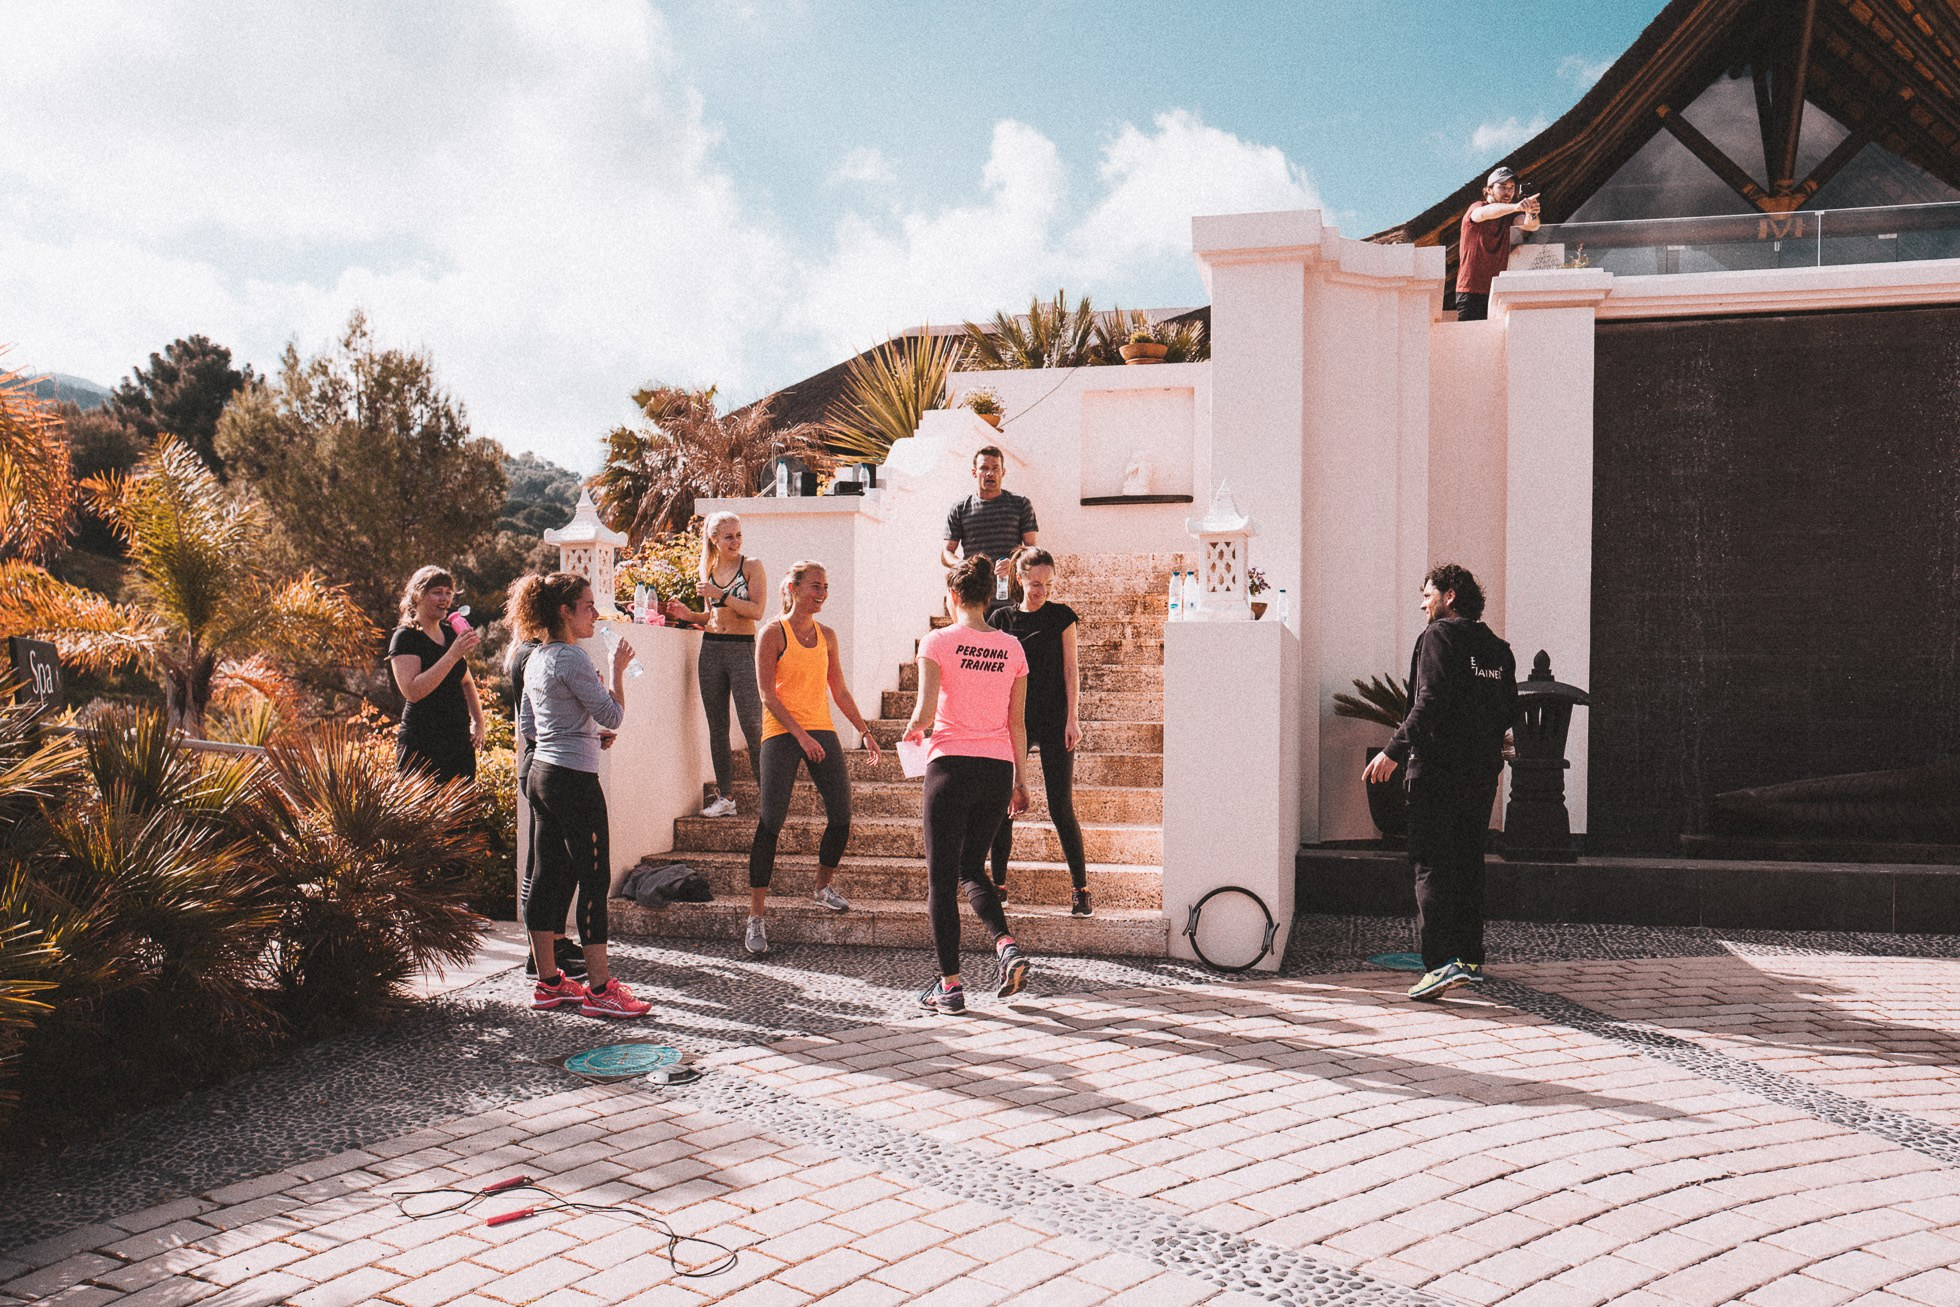 shanti-som-wellbeing-retreat-spain-14